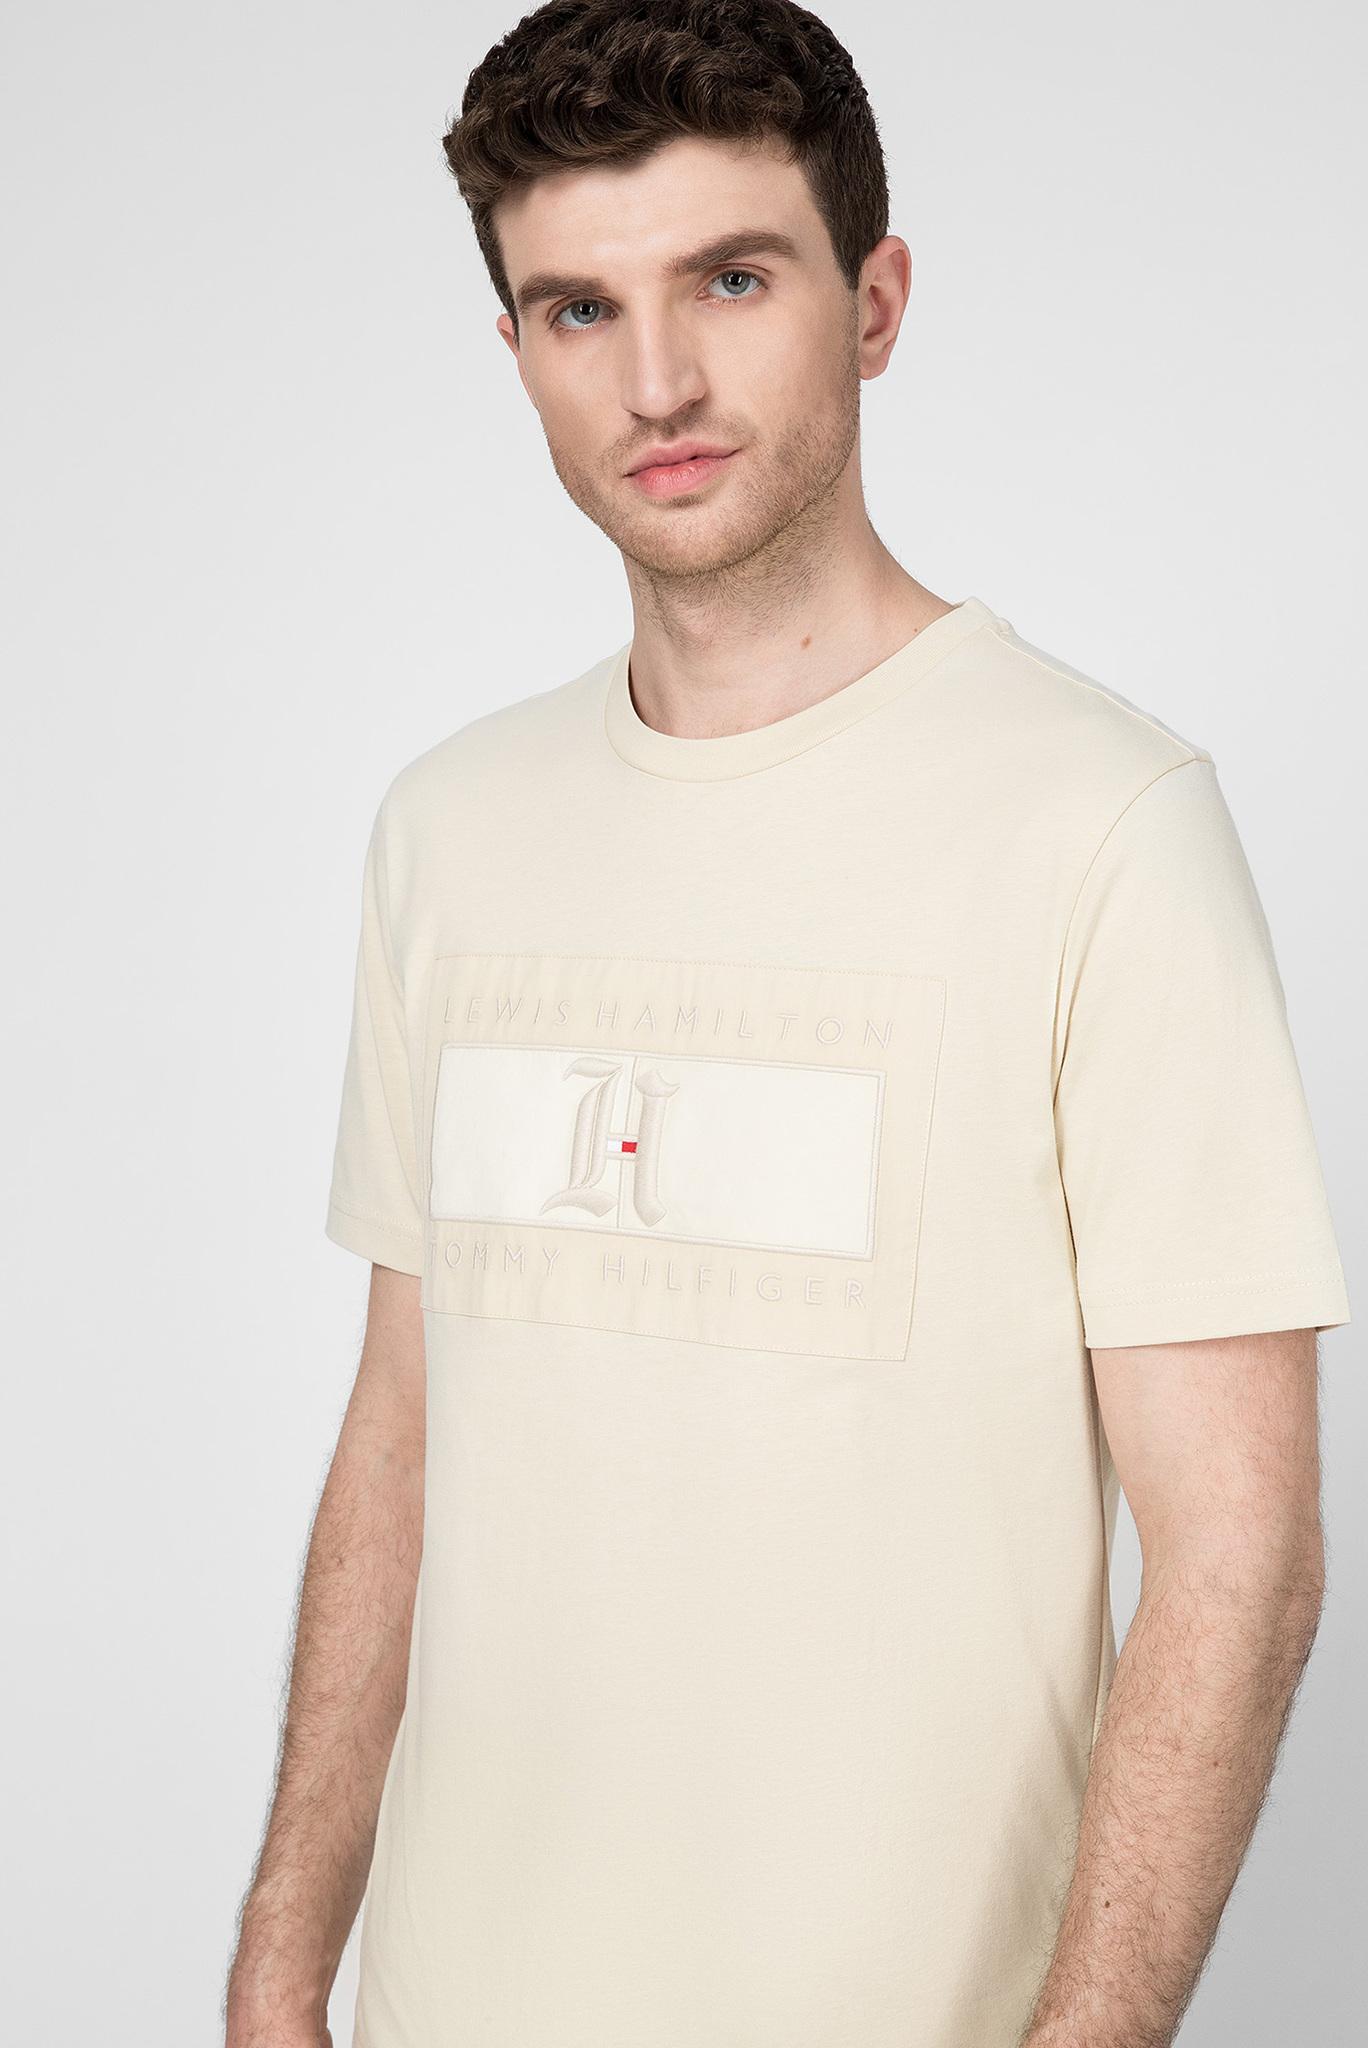 Мужская бежевая футболка Lewis Hamilton Tommy Hilfiger